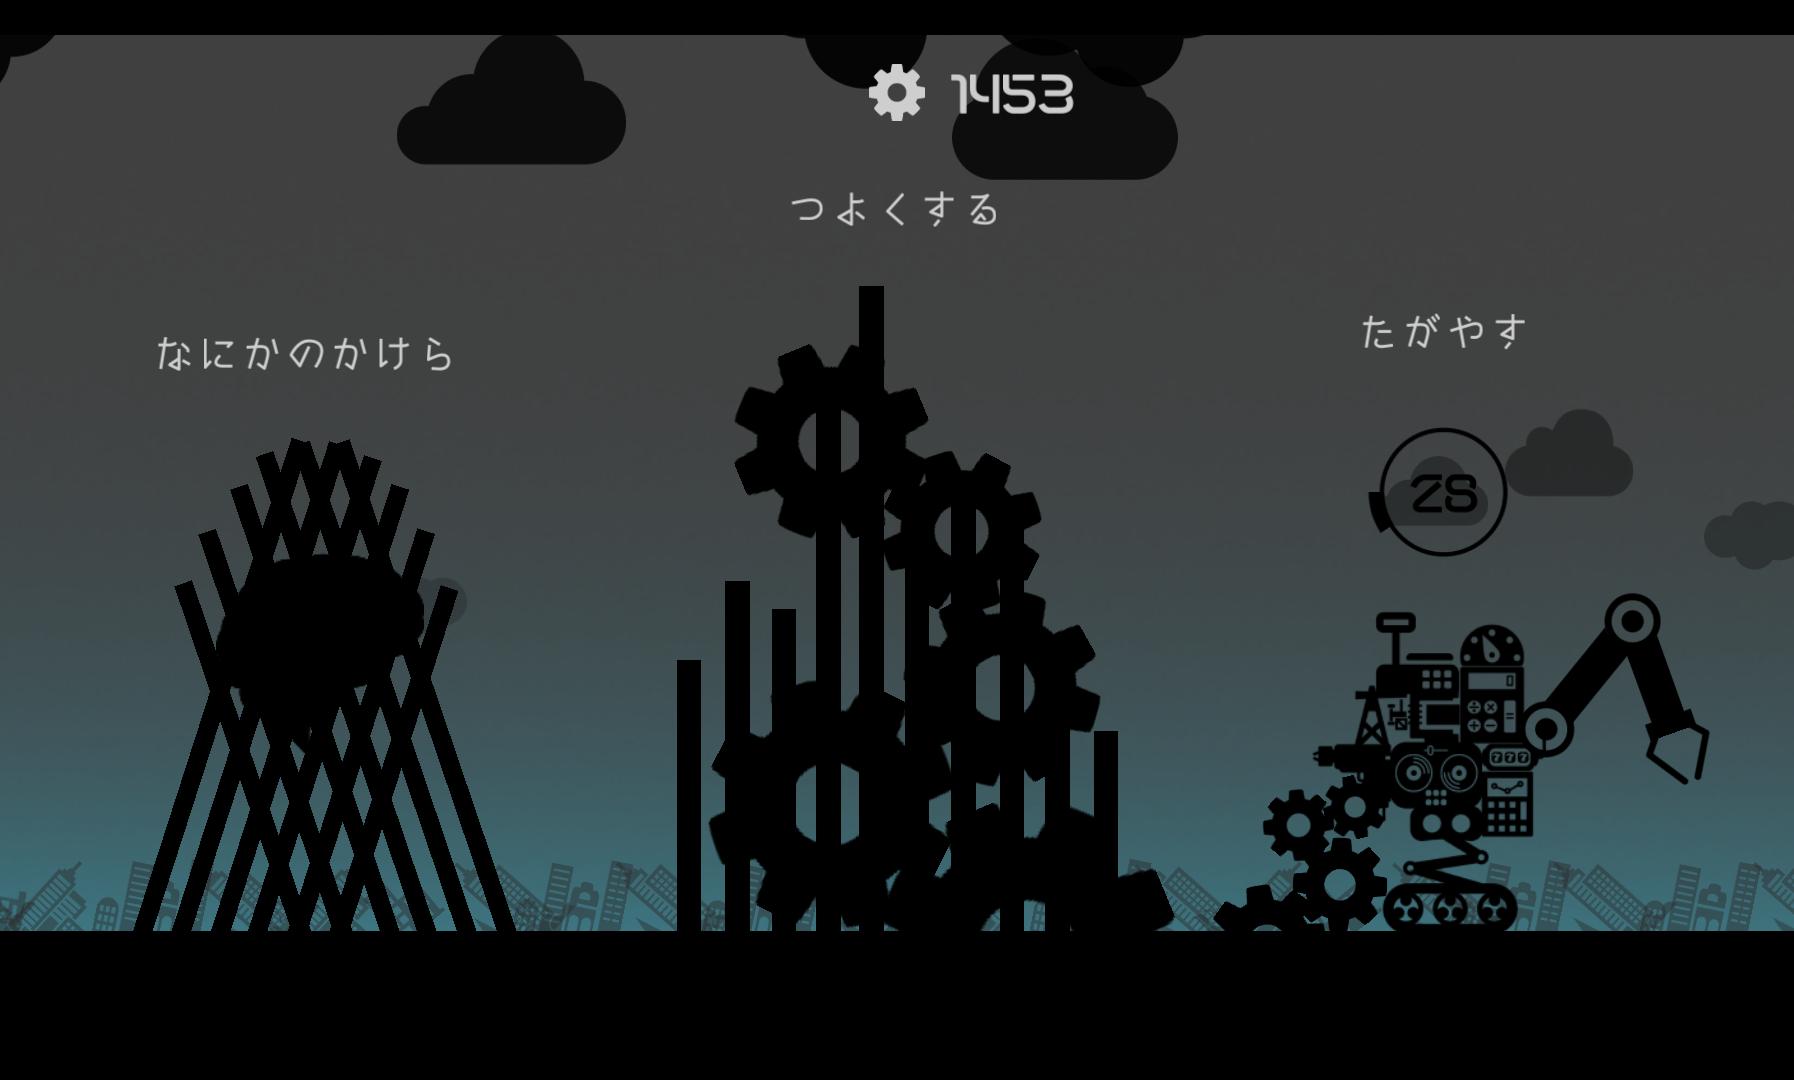 androidアプリ ひとたがやし攻略スクリーンショット5